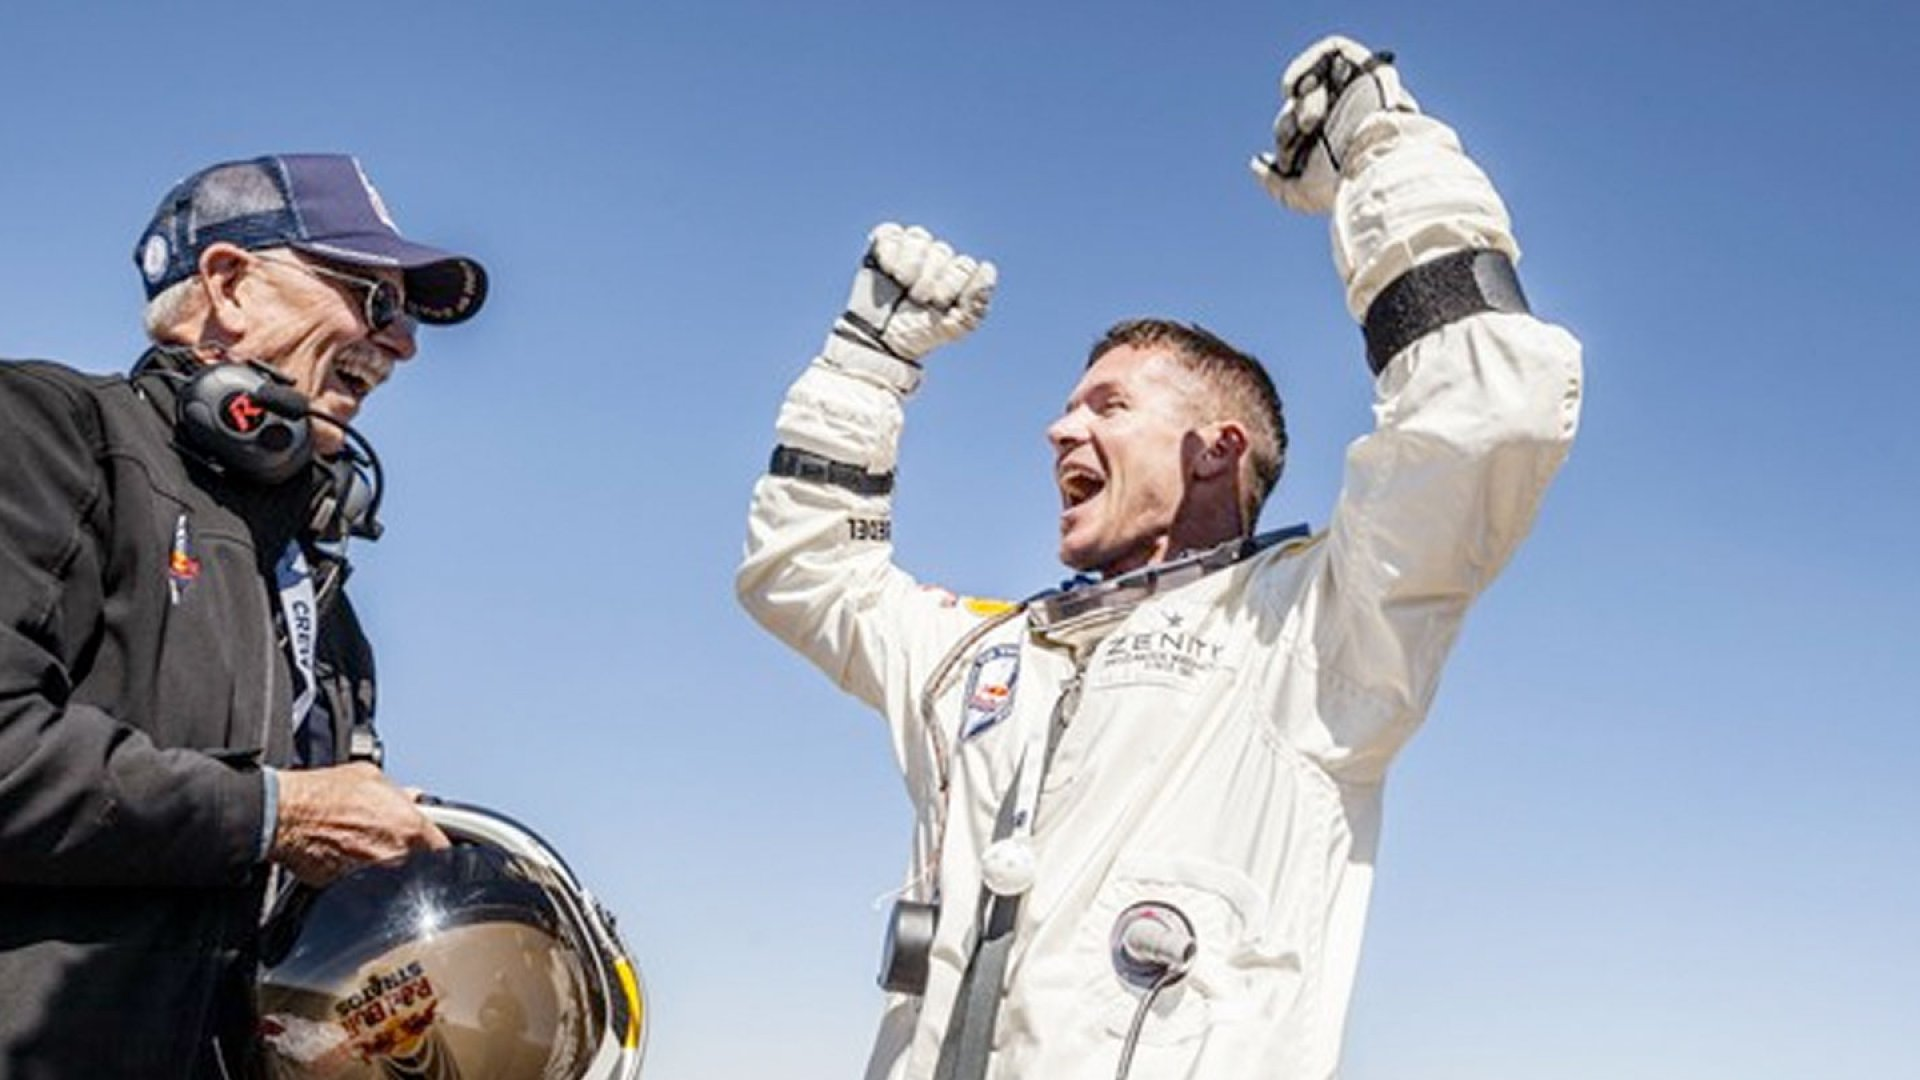 Meet Companies Behind That Historic Space Jump